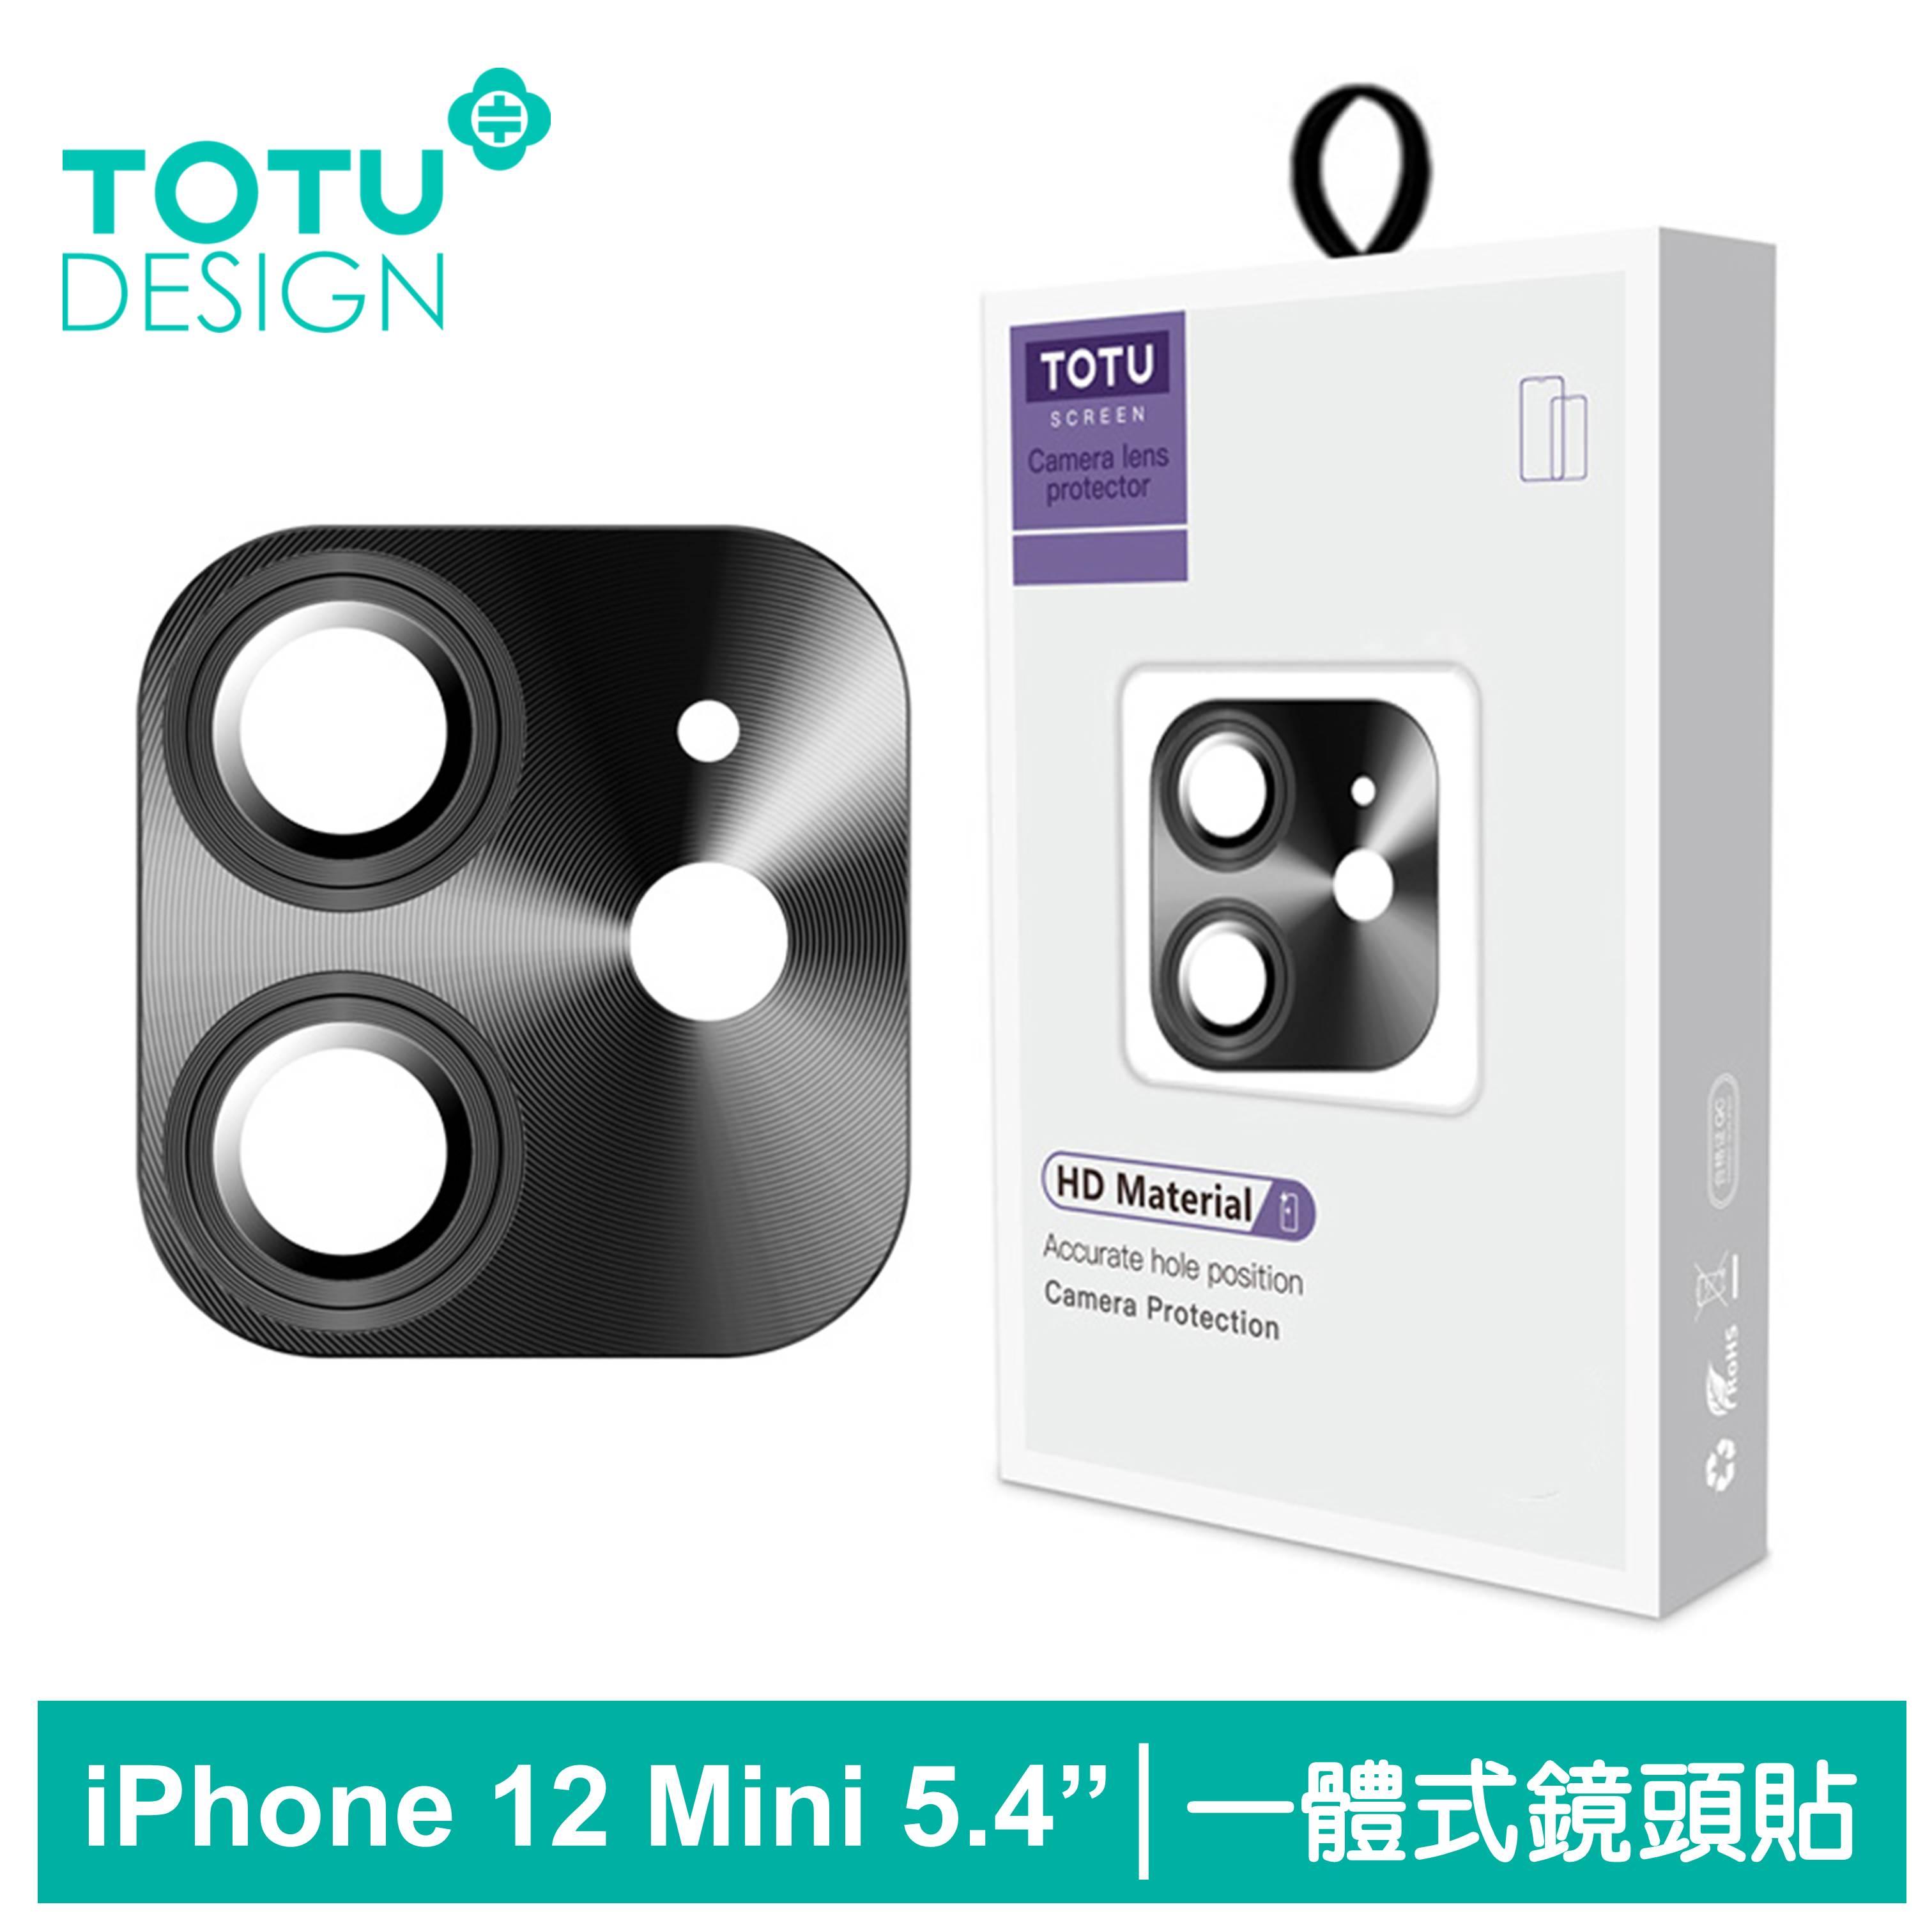 TOTU台灣官方 iPhone 12 Mini 鏡頭貼 i12 Mini 5.4吋 鋼化膜 保護貼 一體式鋁合金鋼化玻璃 鎧甲系列 黑色